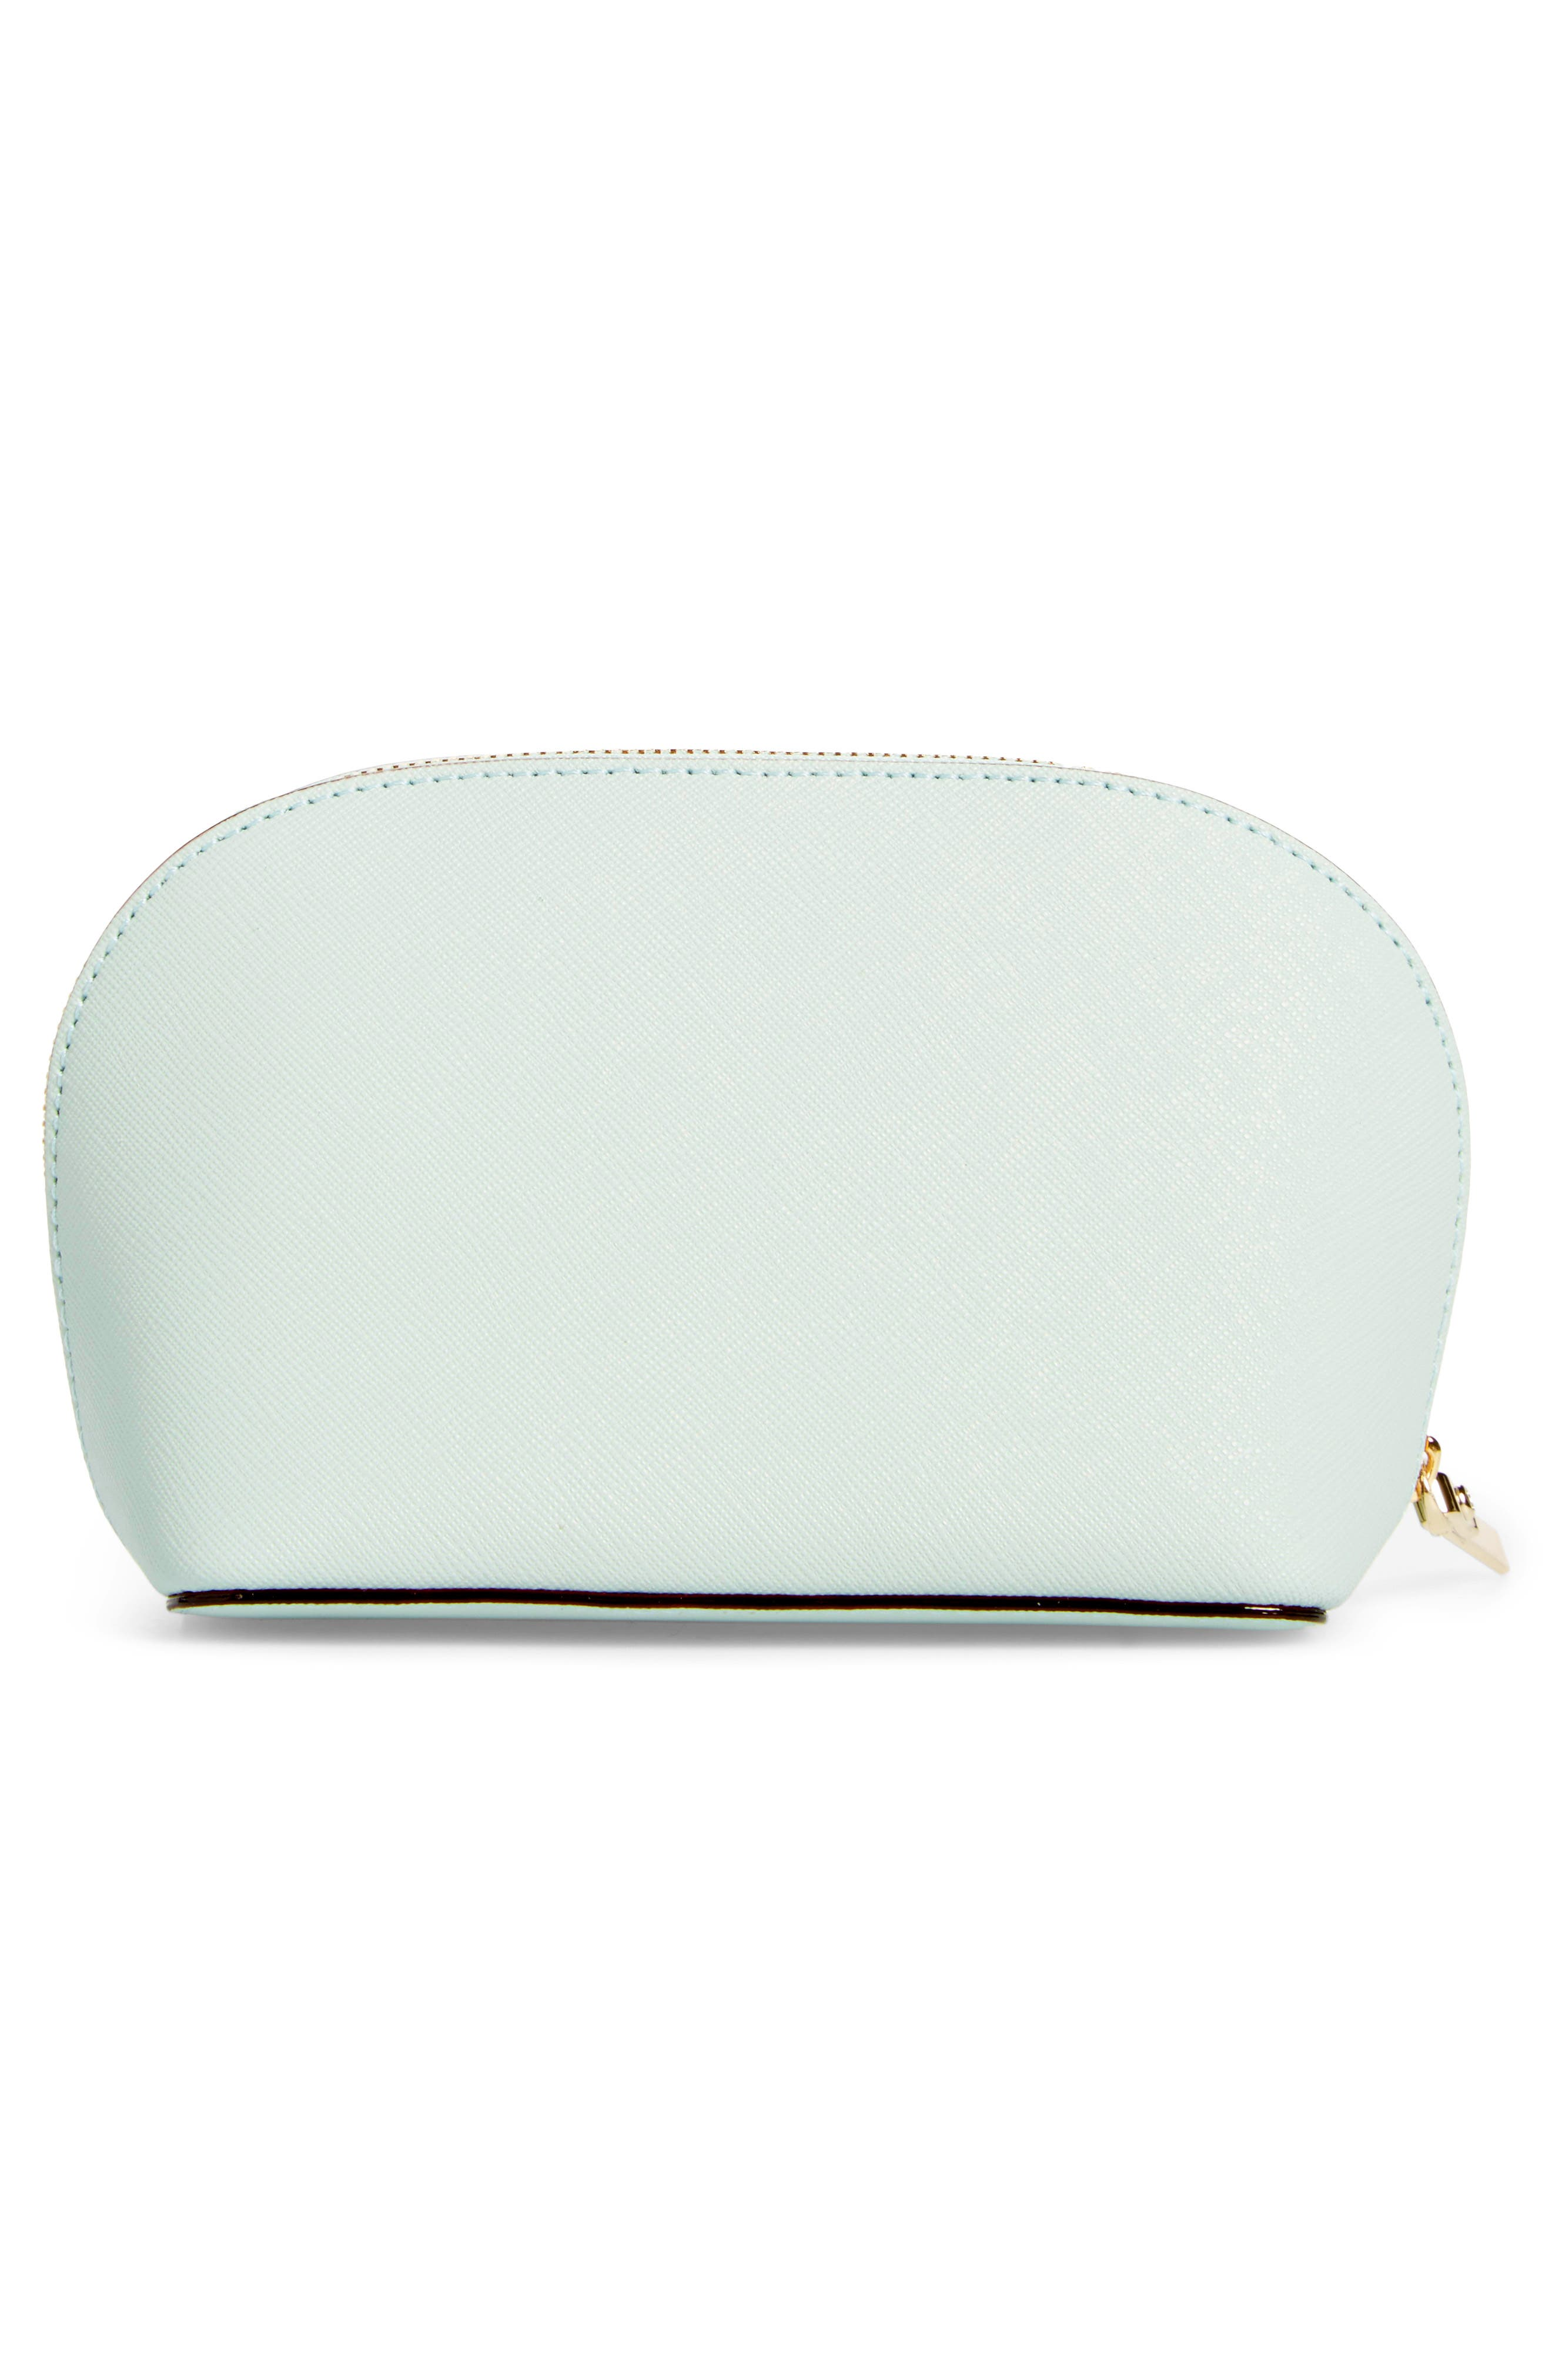 cameron street - small abalene leather cosmetics bag,                             Alternate thumbnail 2, color,                             302